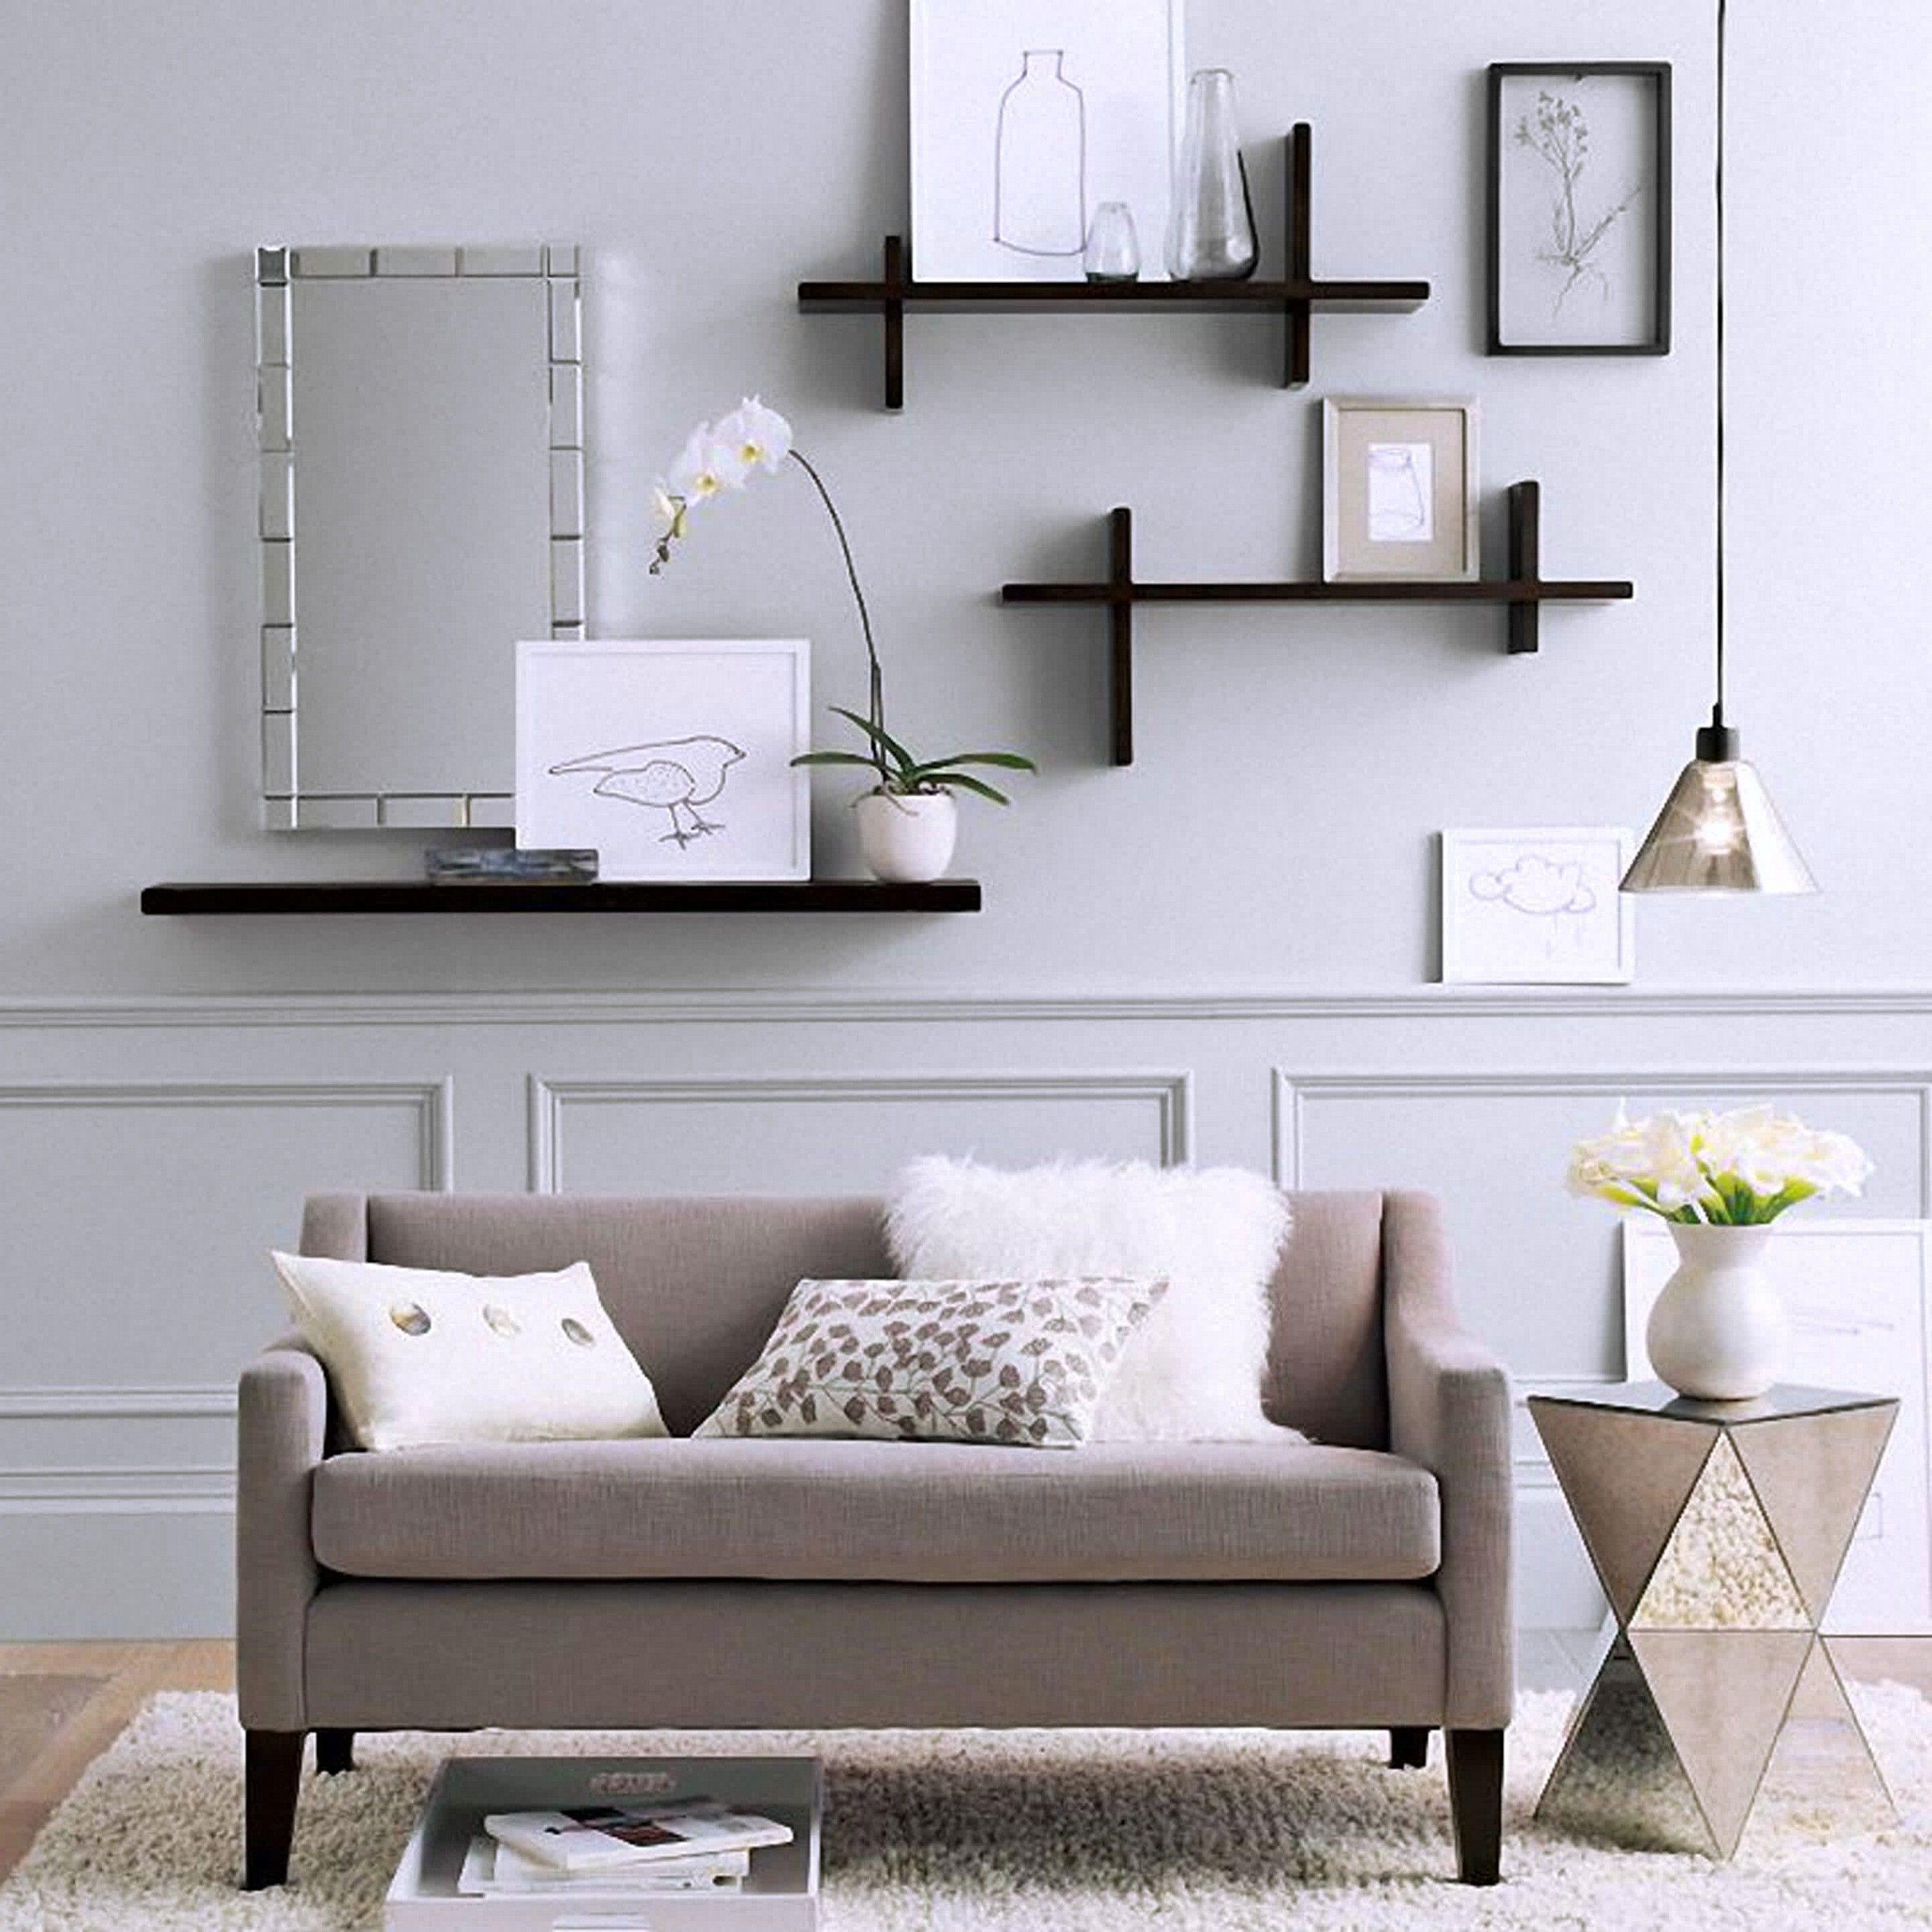 Shelving Ideas For Living Room Walls Floating Shelves Living Room Wall Shelves Living Room Home Living Room #wall #accessories #living #room